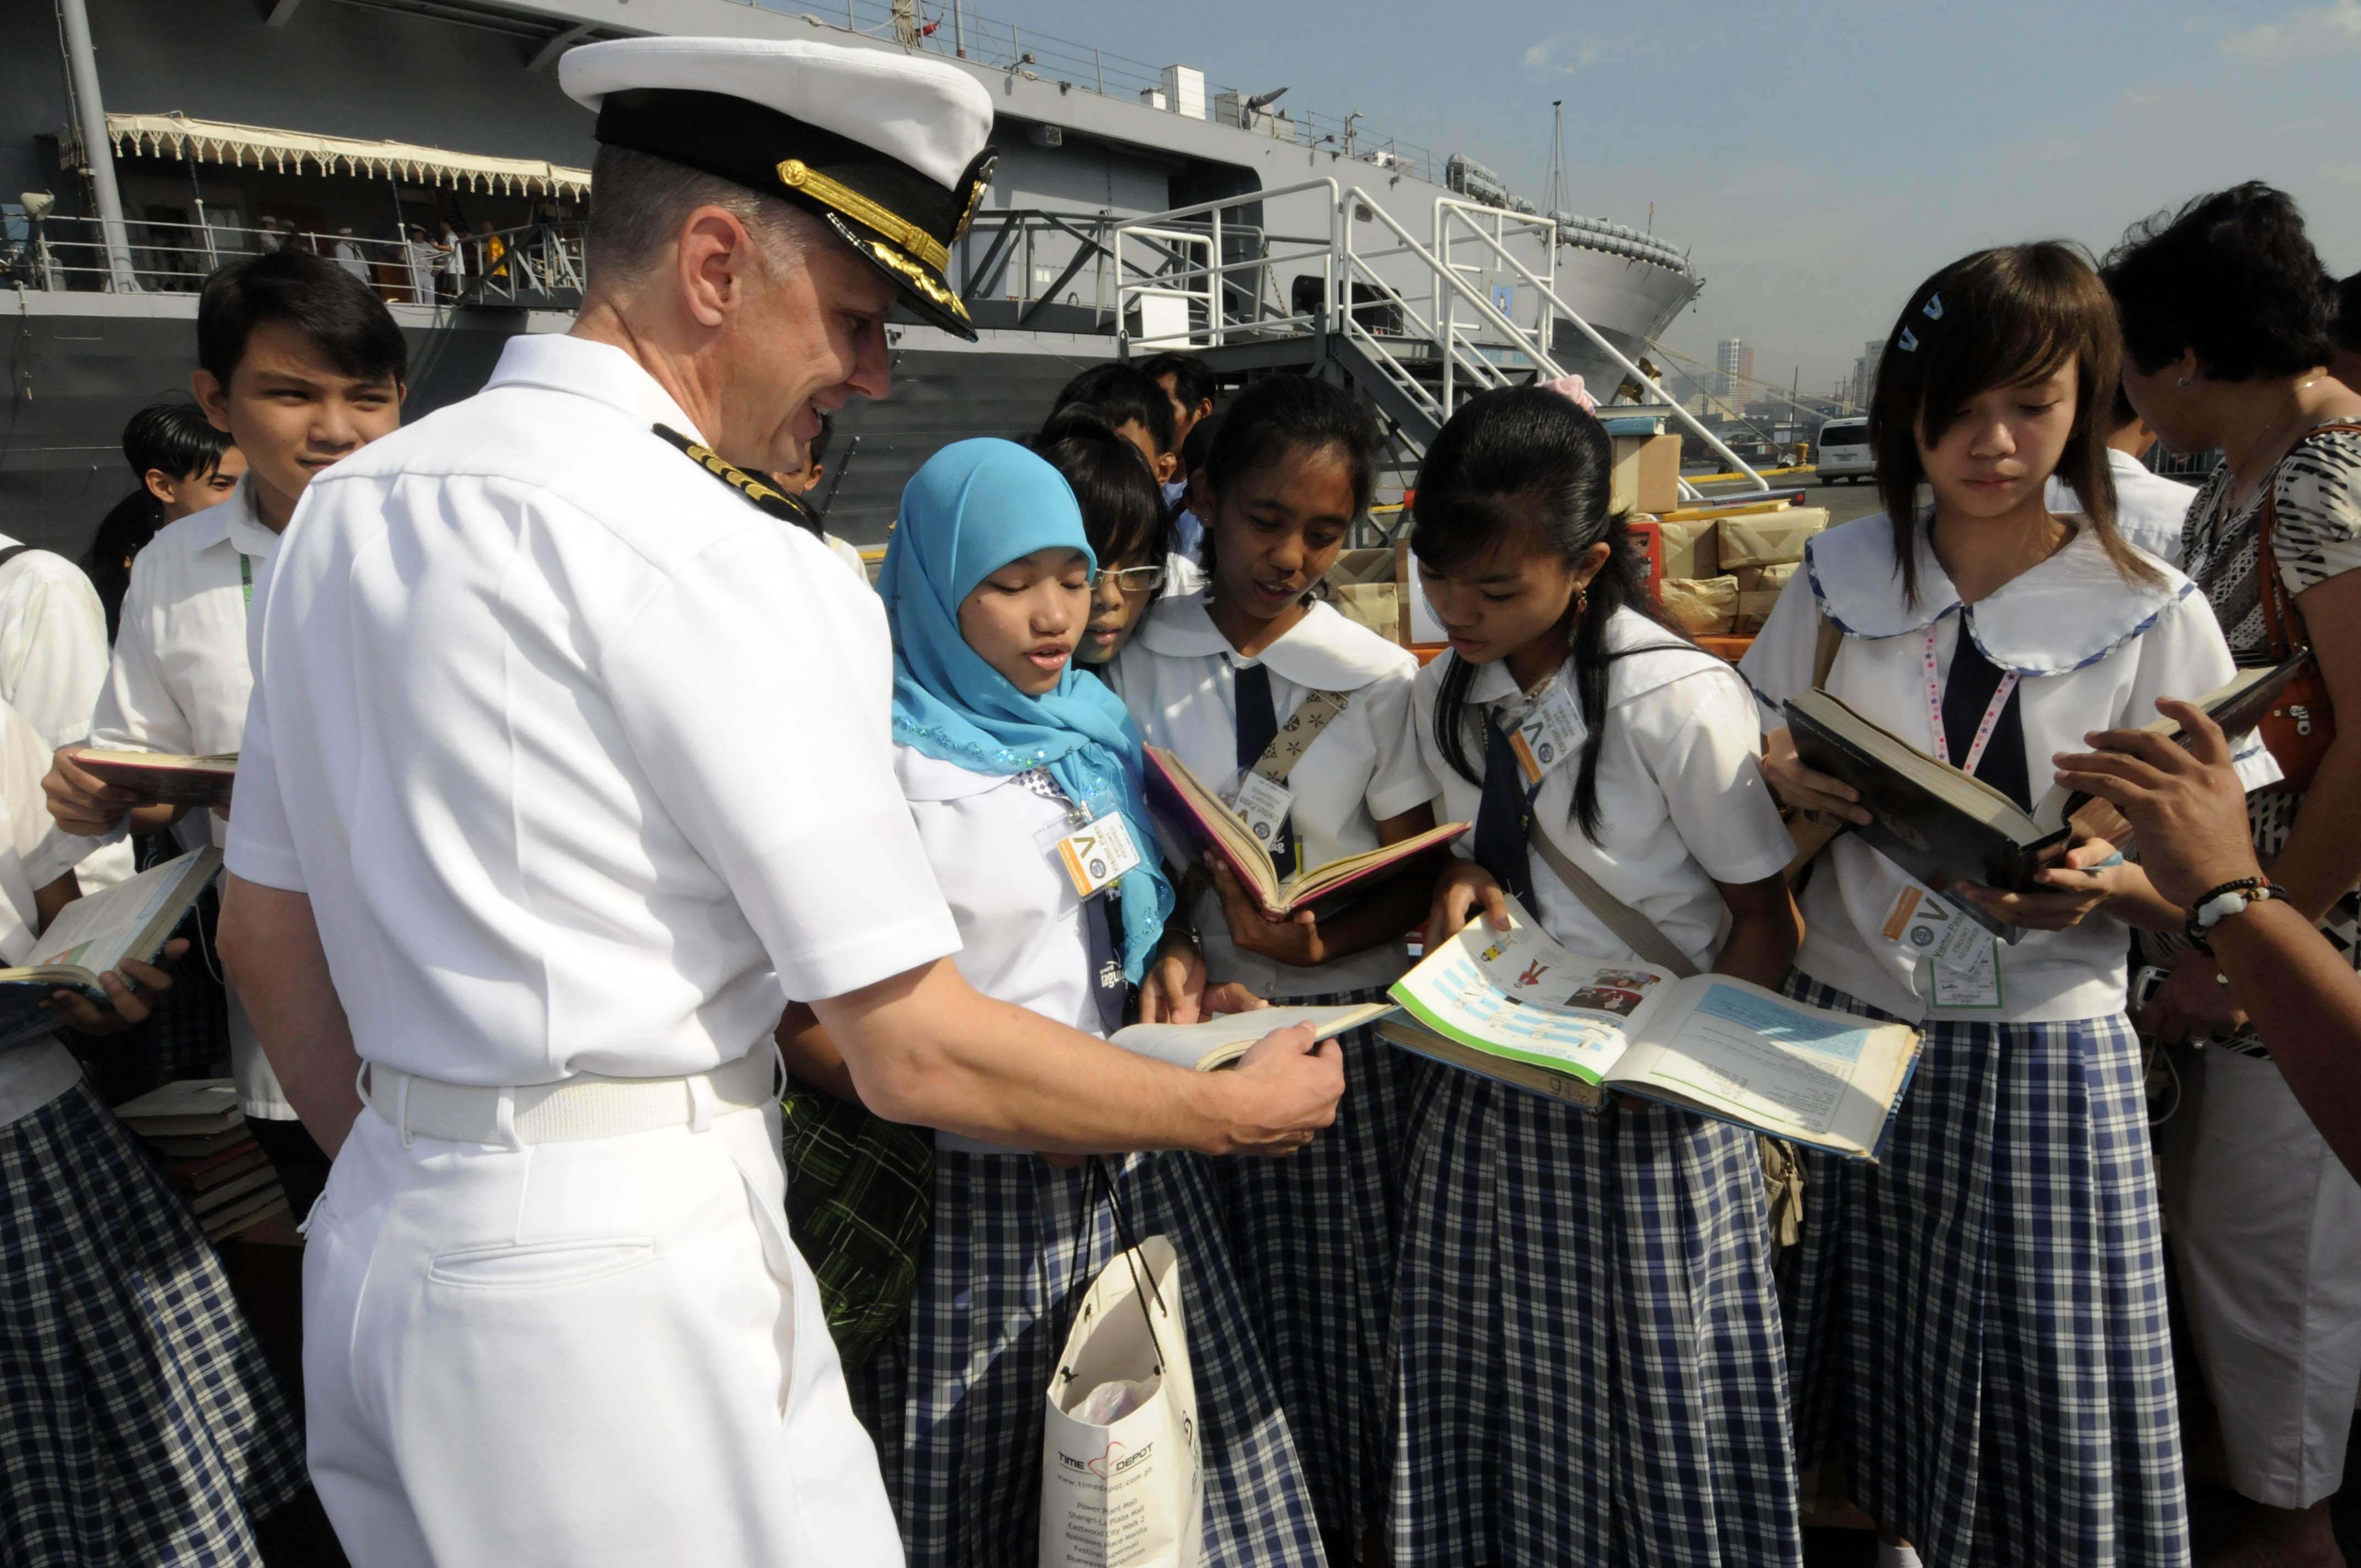 Fileus Navy 090220 N 3830j 045 Capt Thom W Burke Commanding